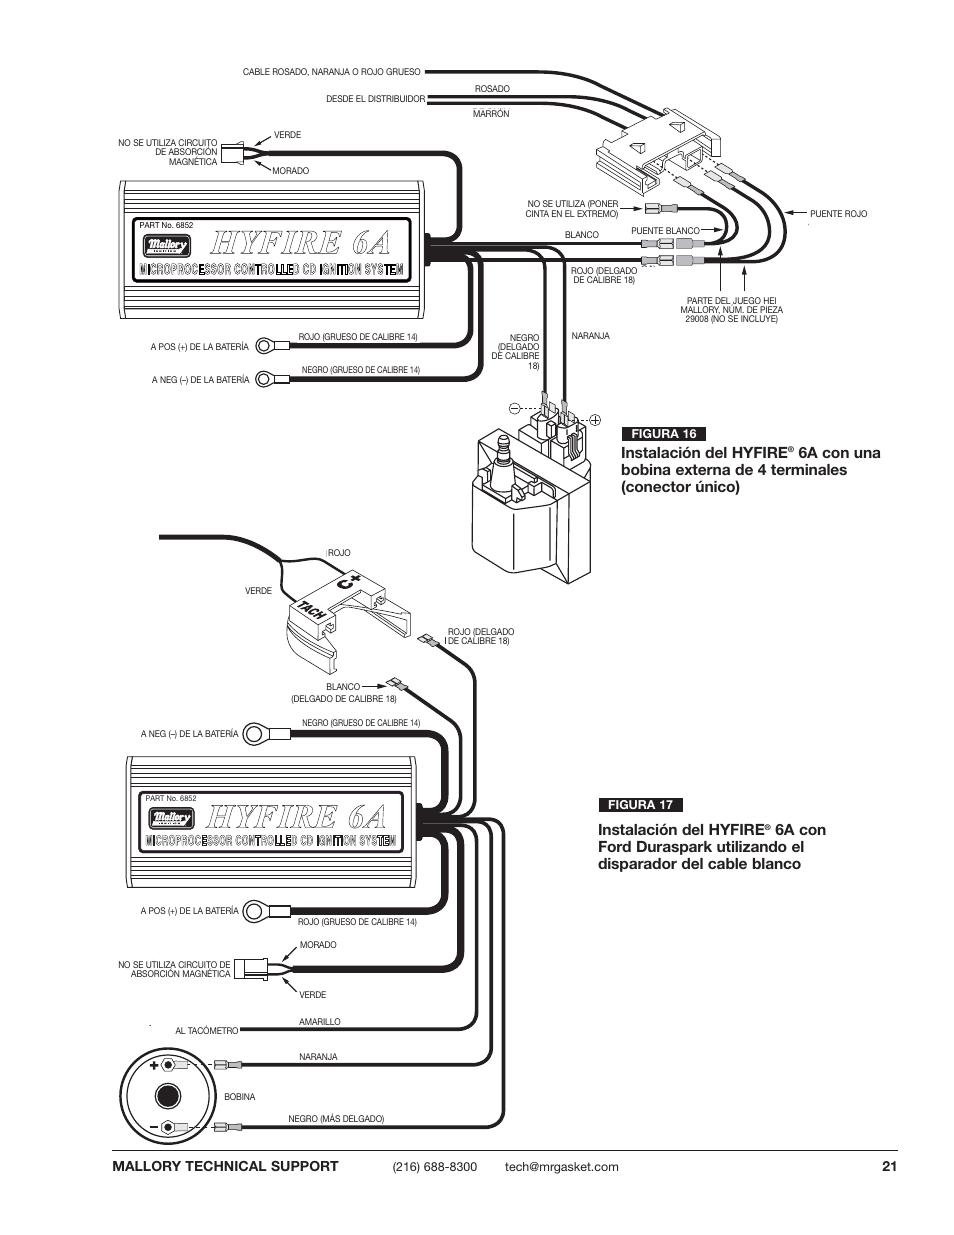 mallory 6a high fire wiring diagram